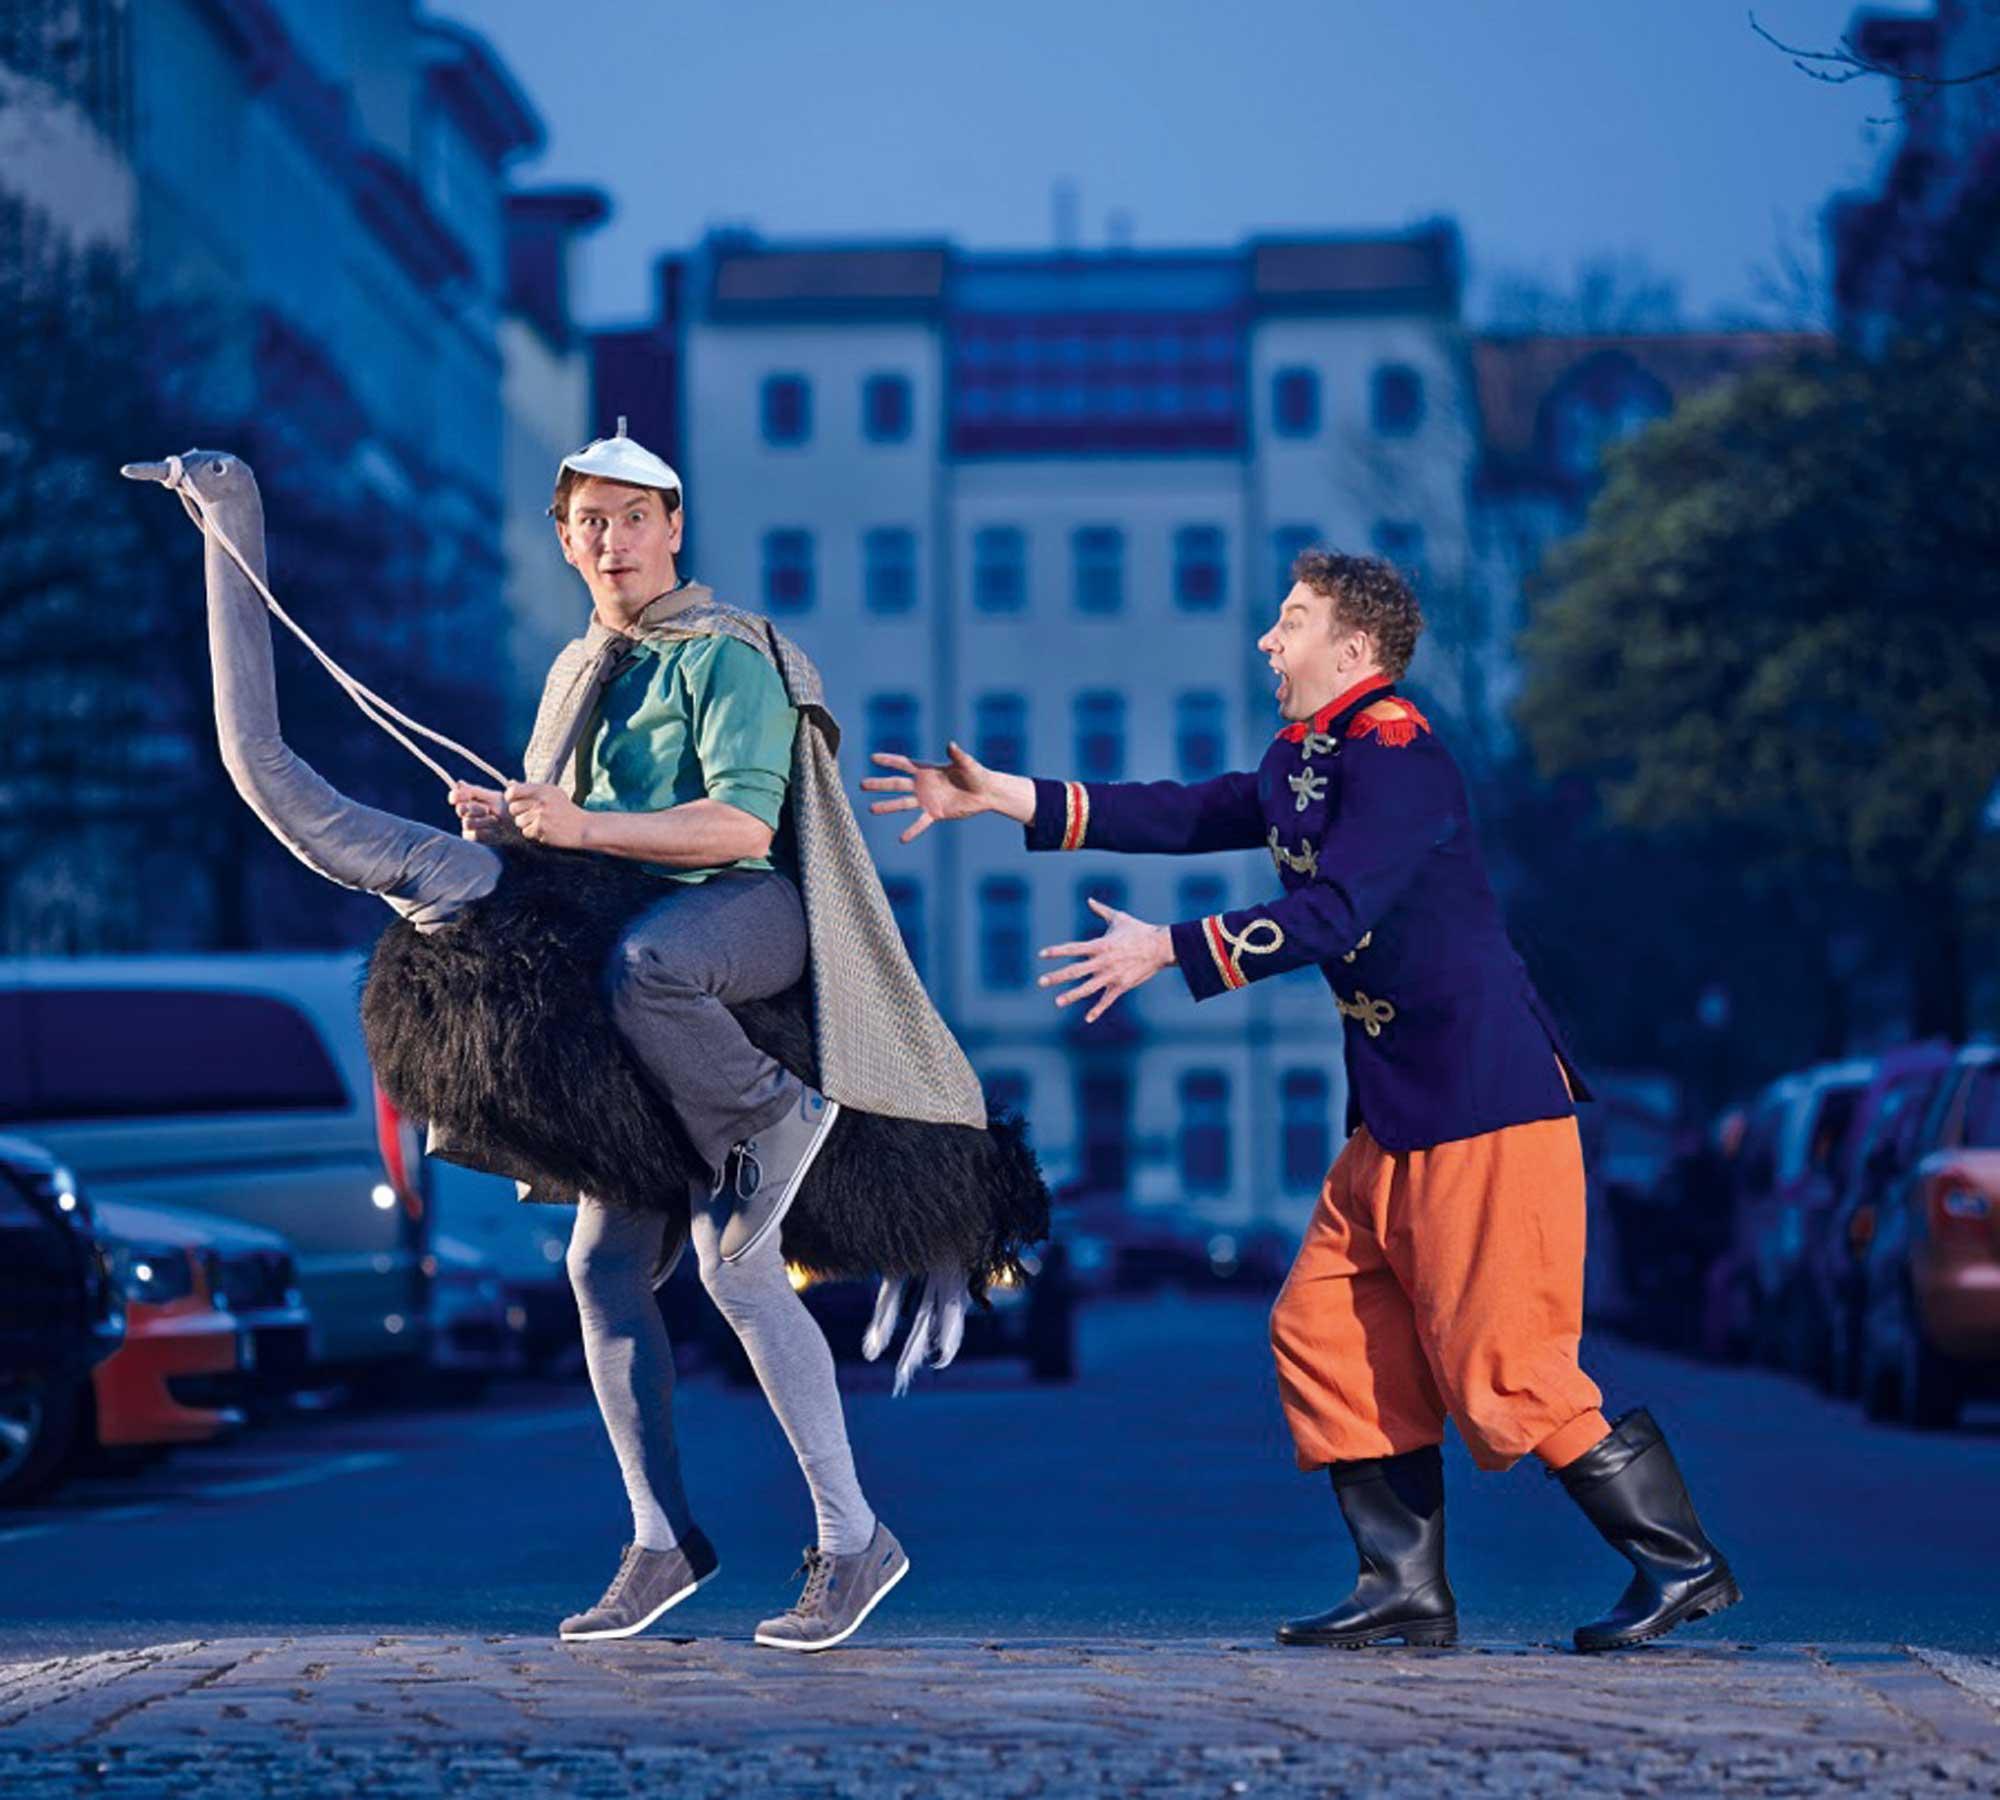 Kindergeburtstag für Grundschulkinder mit Zirkus in Berlin // HIMBEER